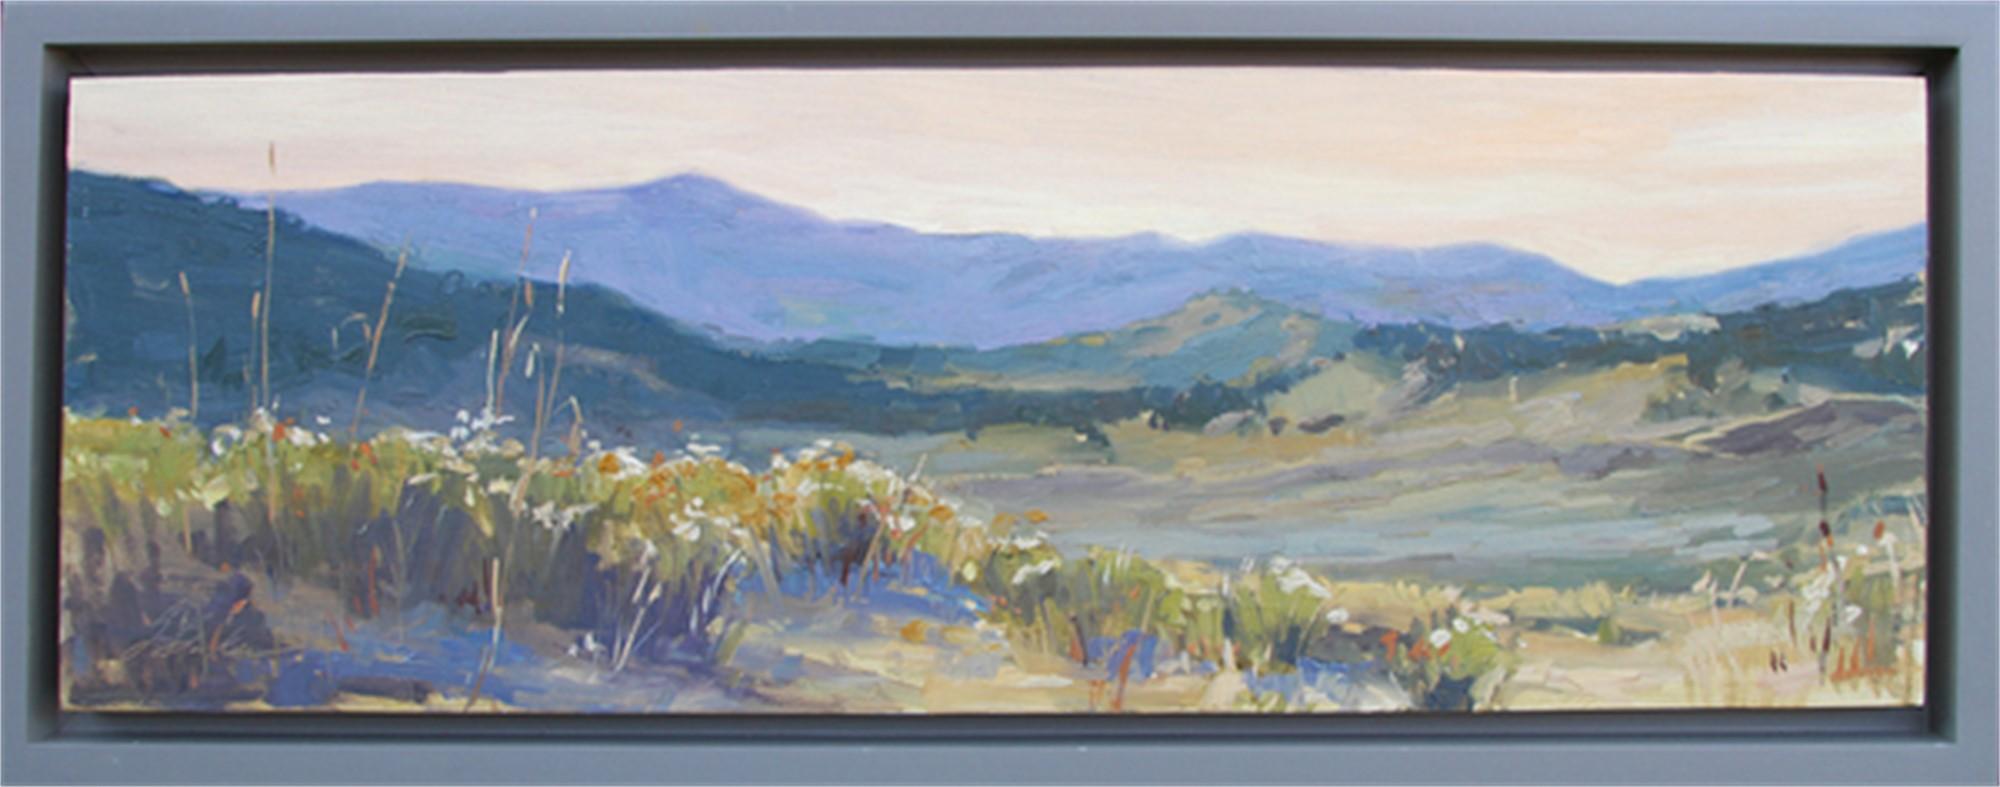 Lamar Valley by Suzie Baker